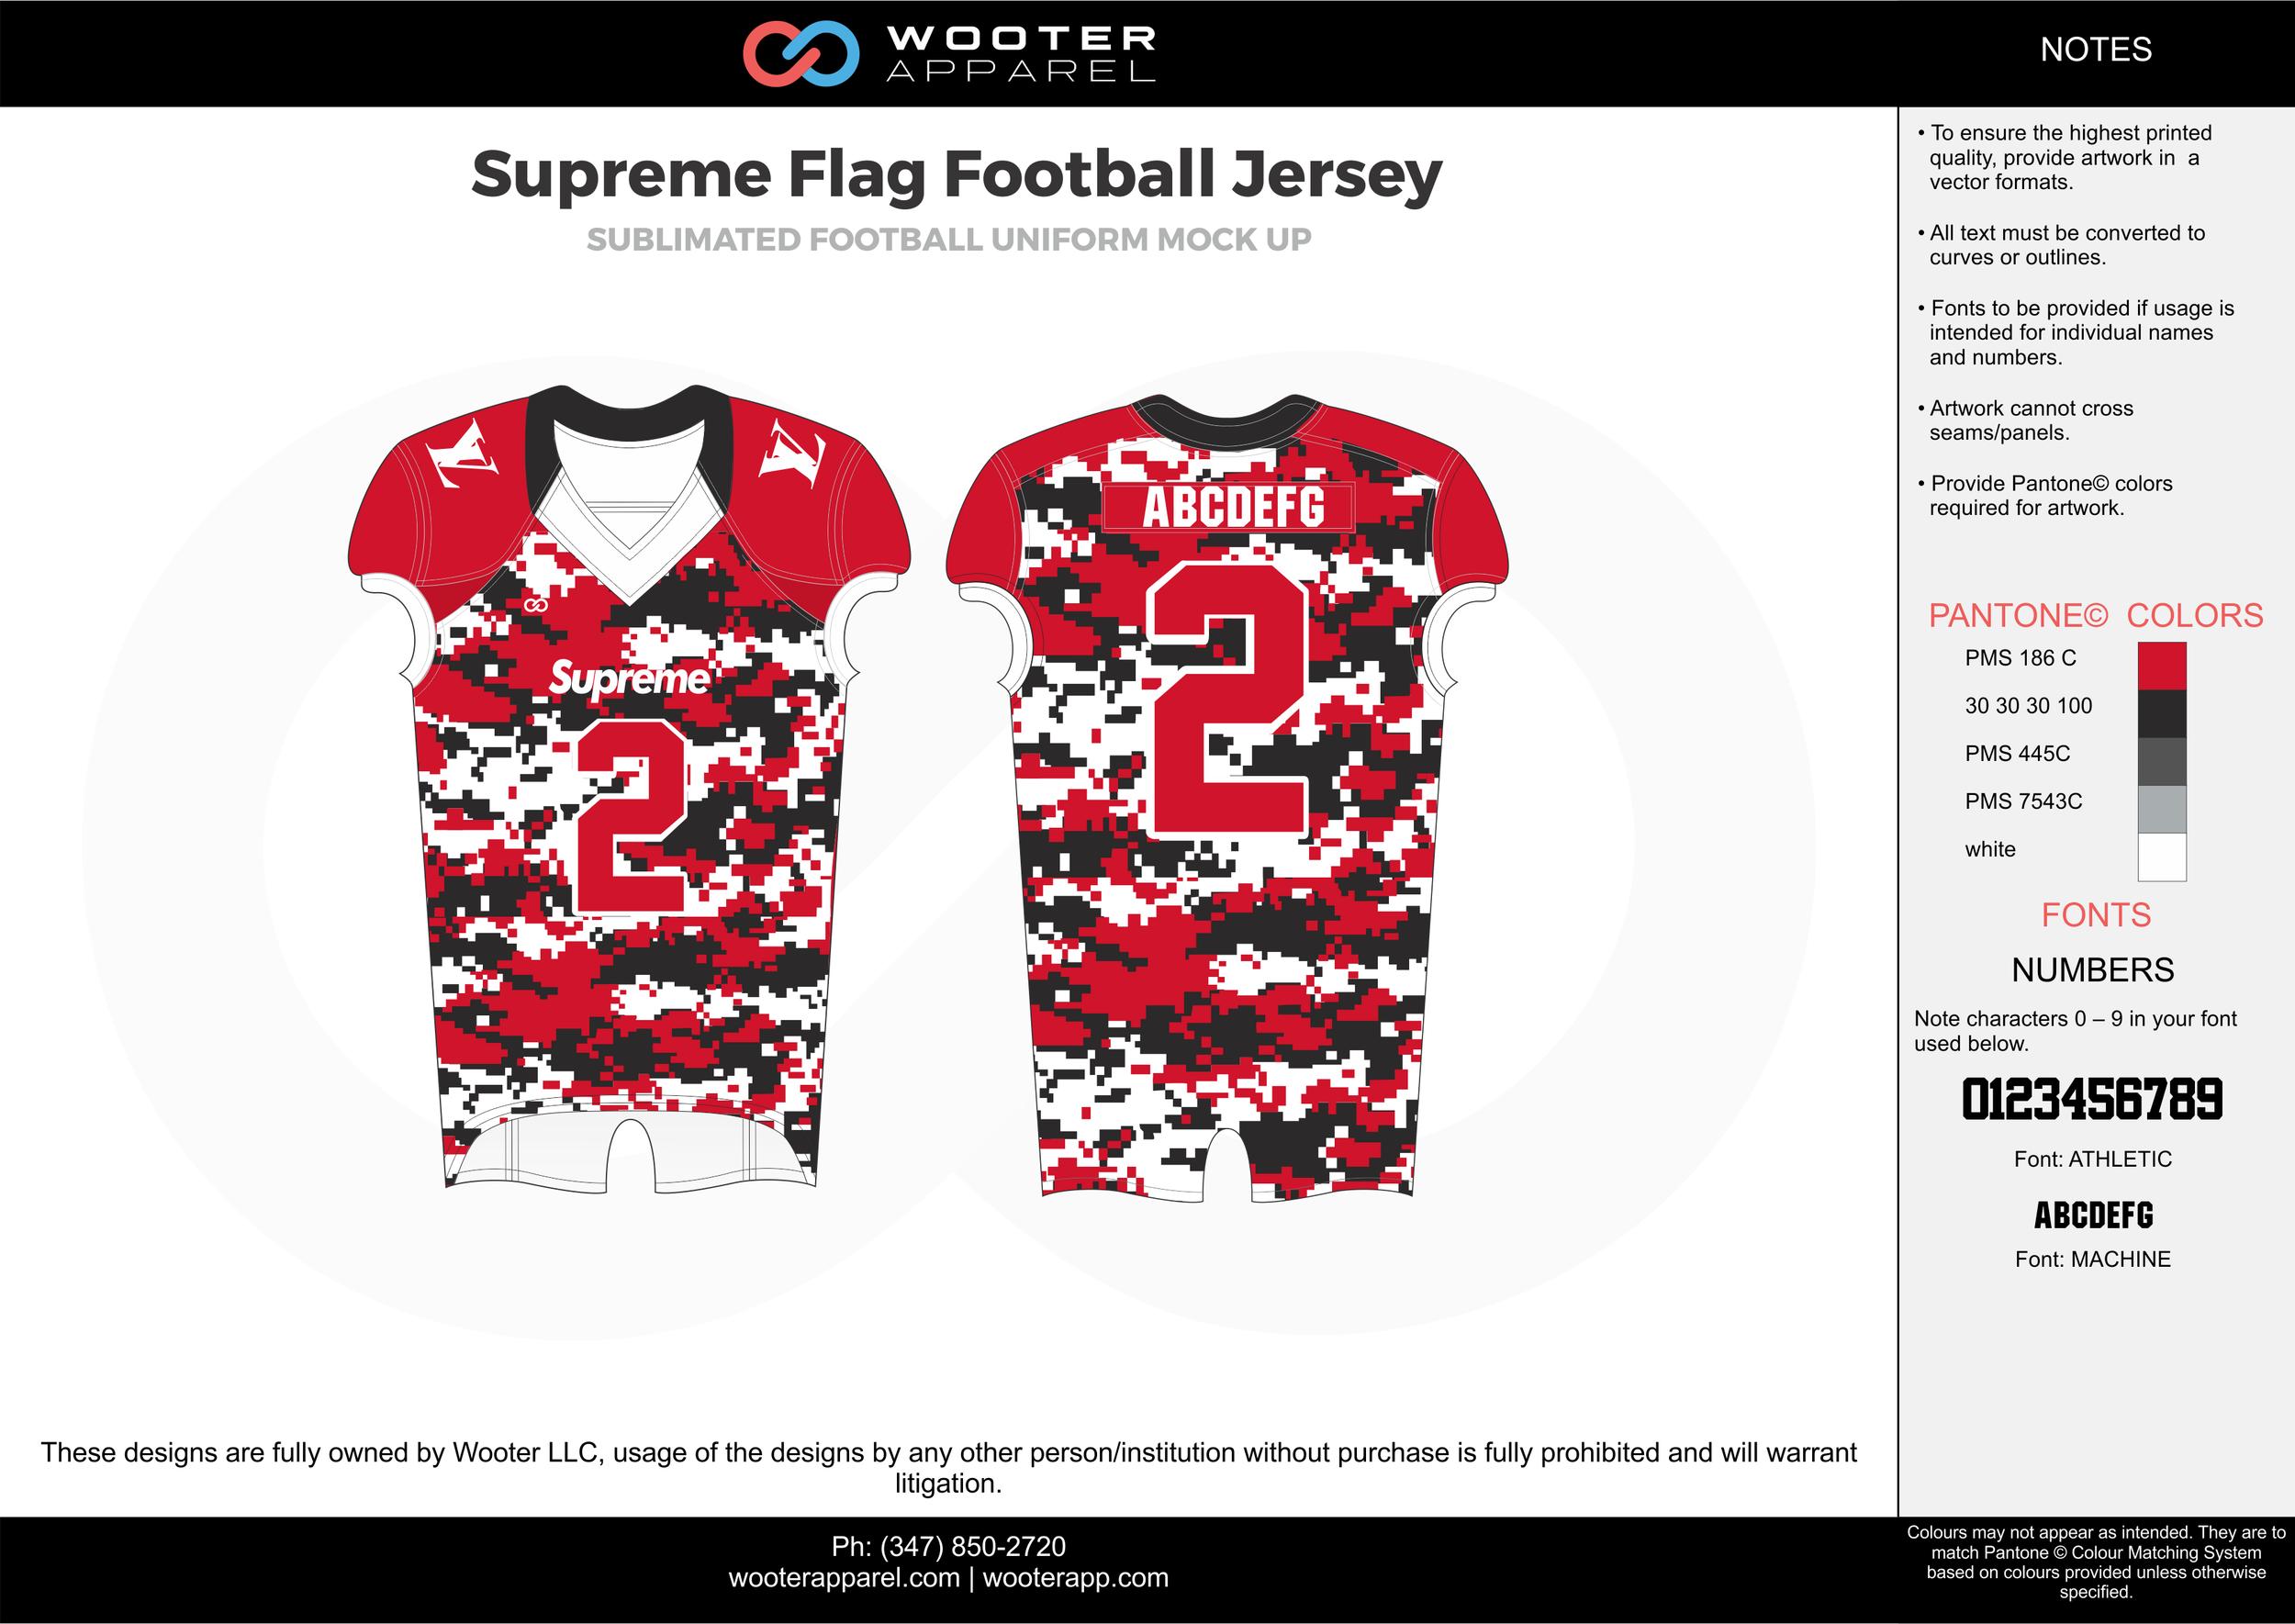 SUPREME FLAG FOOTBALL JERSEY red white black gray flag football uniforms jerseys top